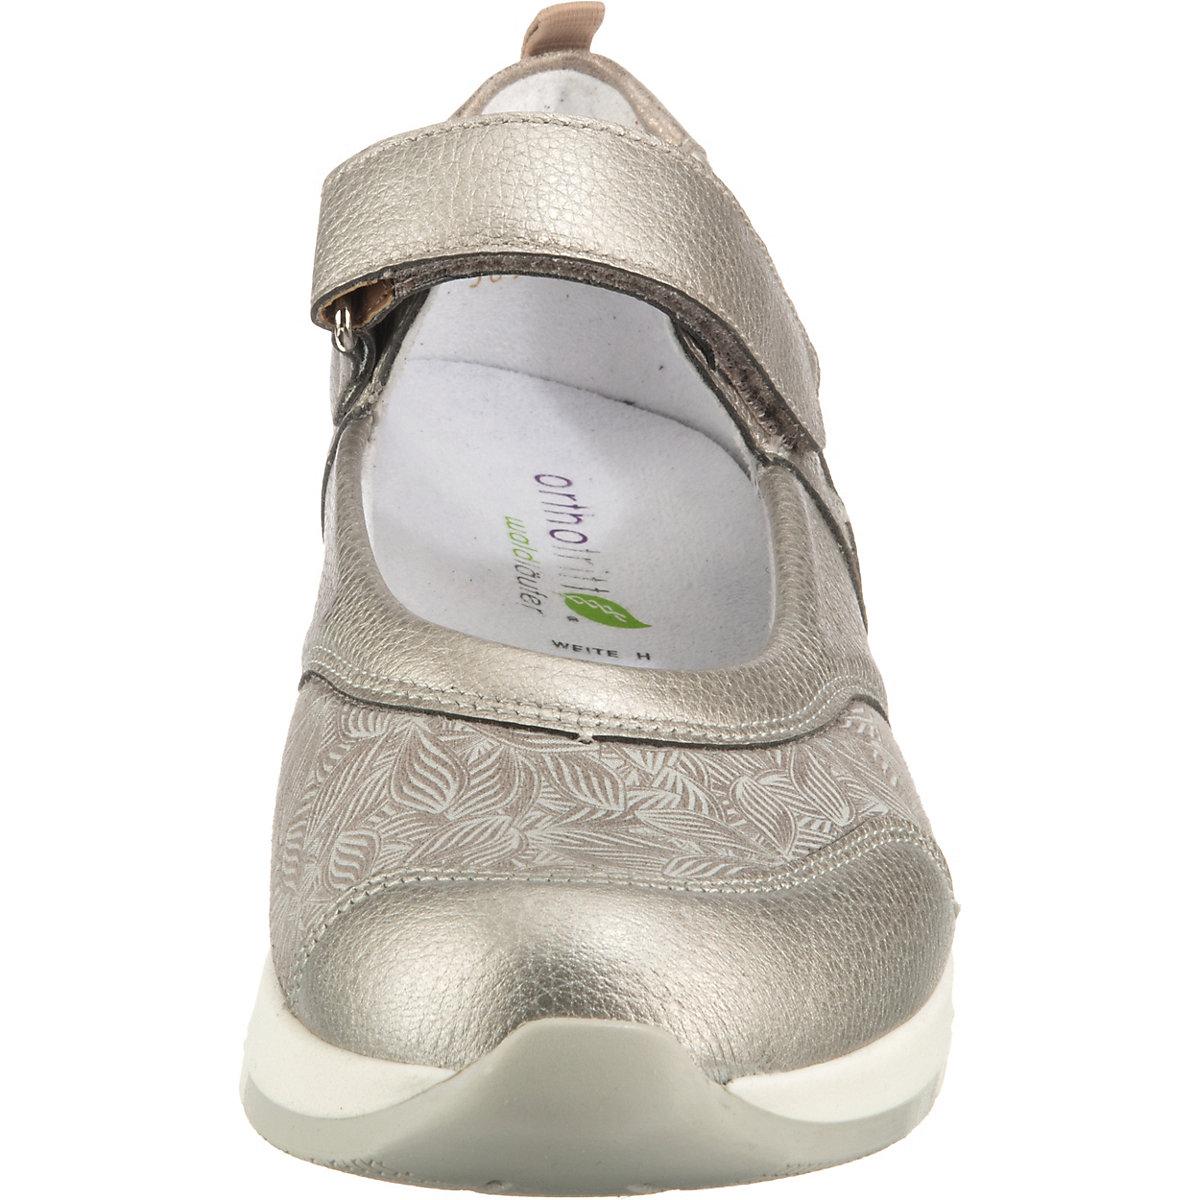 Waldläufer, H-petra Komfort-ballerinas, Silber